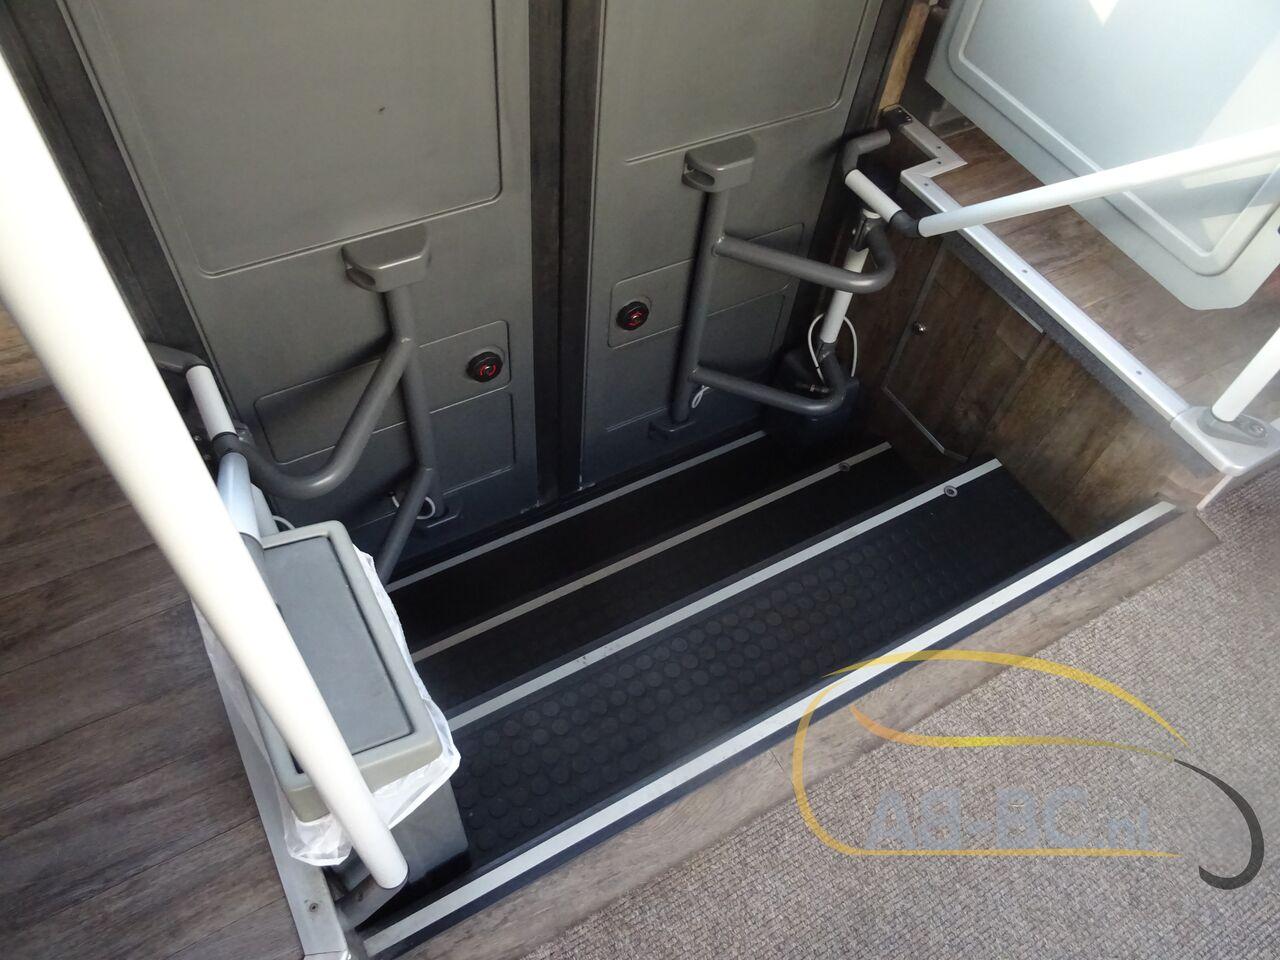 coach-bus-SETRA-S415H-52-Seats-EURO-6-Liftbus---1630913435778788887_big_ec901b404a1be3e9dcbae3cef760b0ee--21070517141280735500